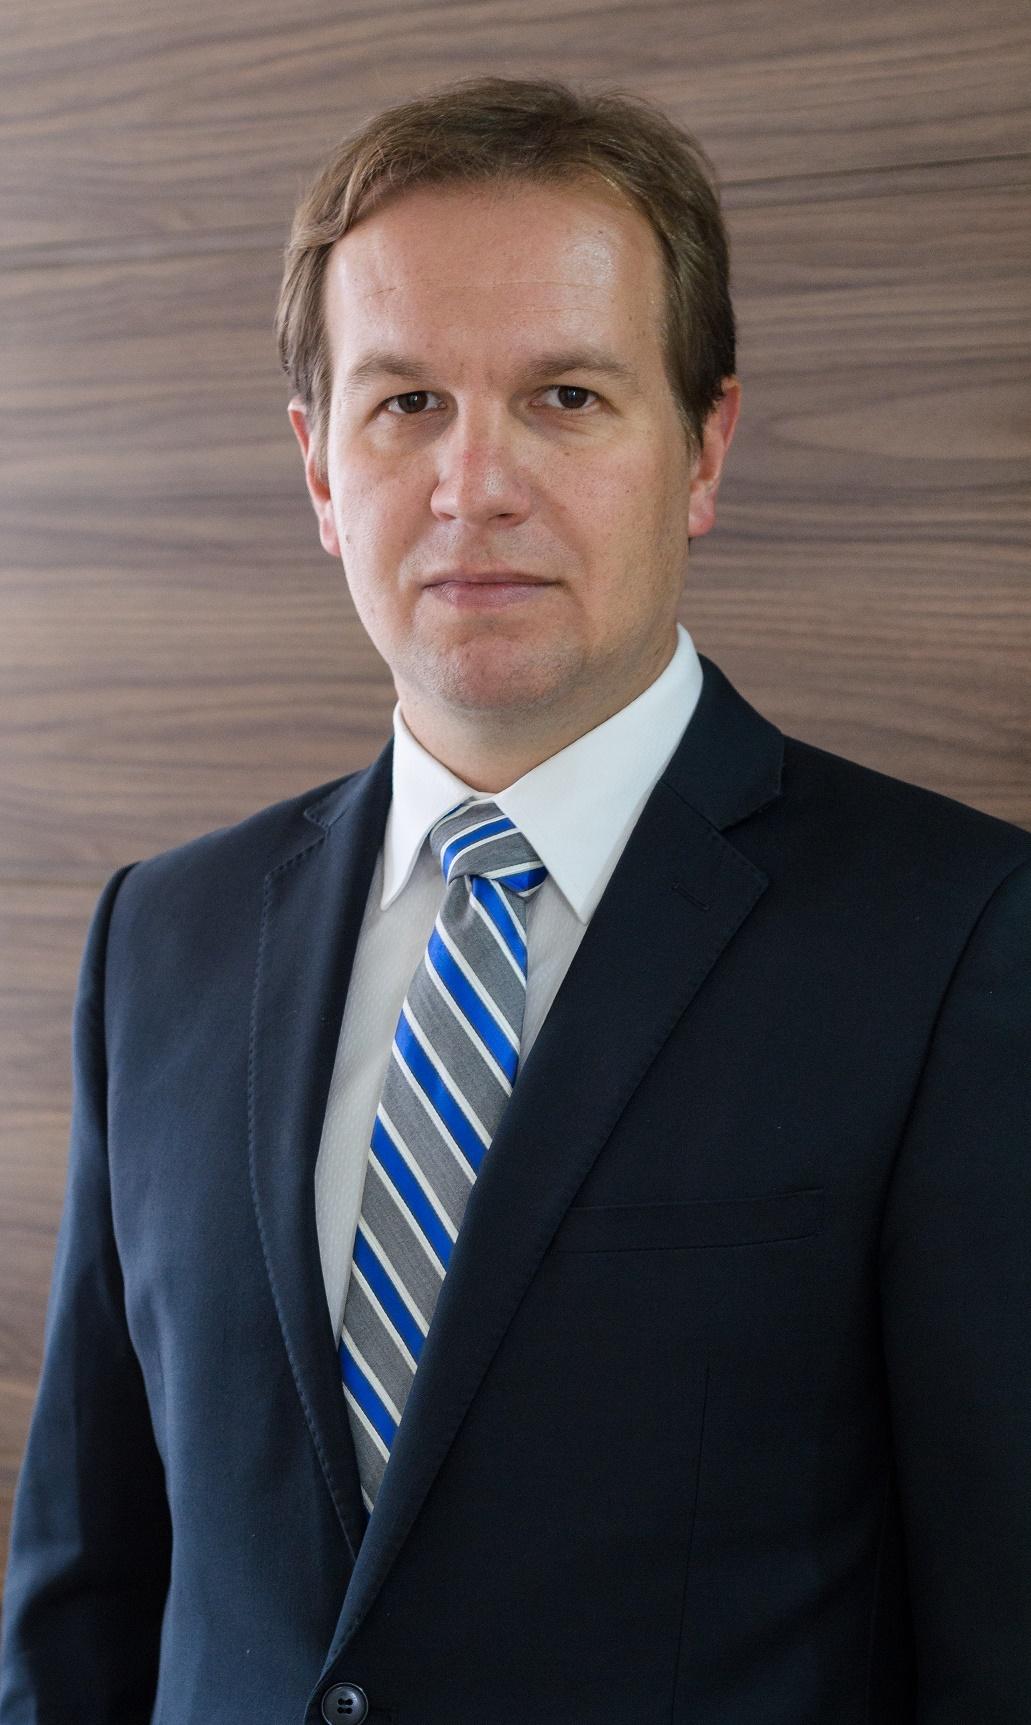 Marcel Kesselring Ferreira da Costa - Turismo on Line